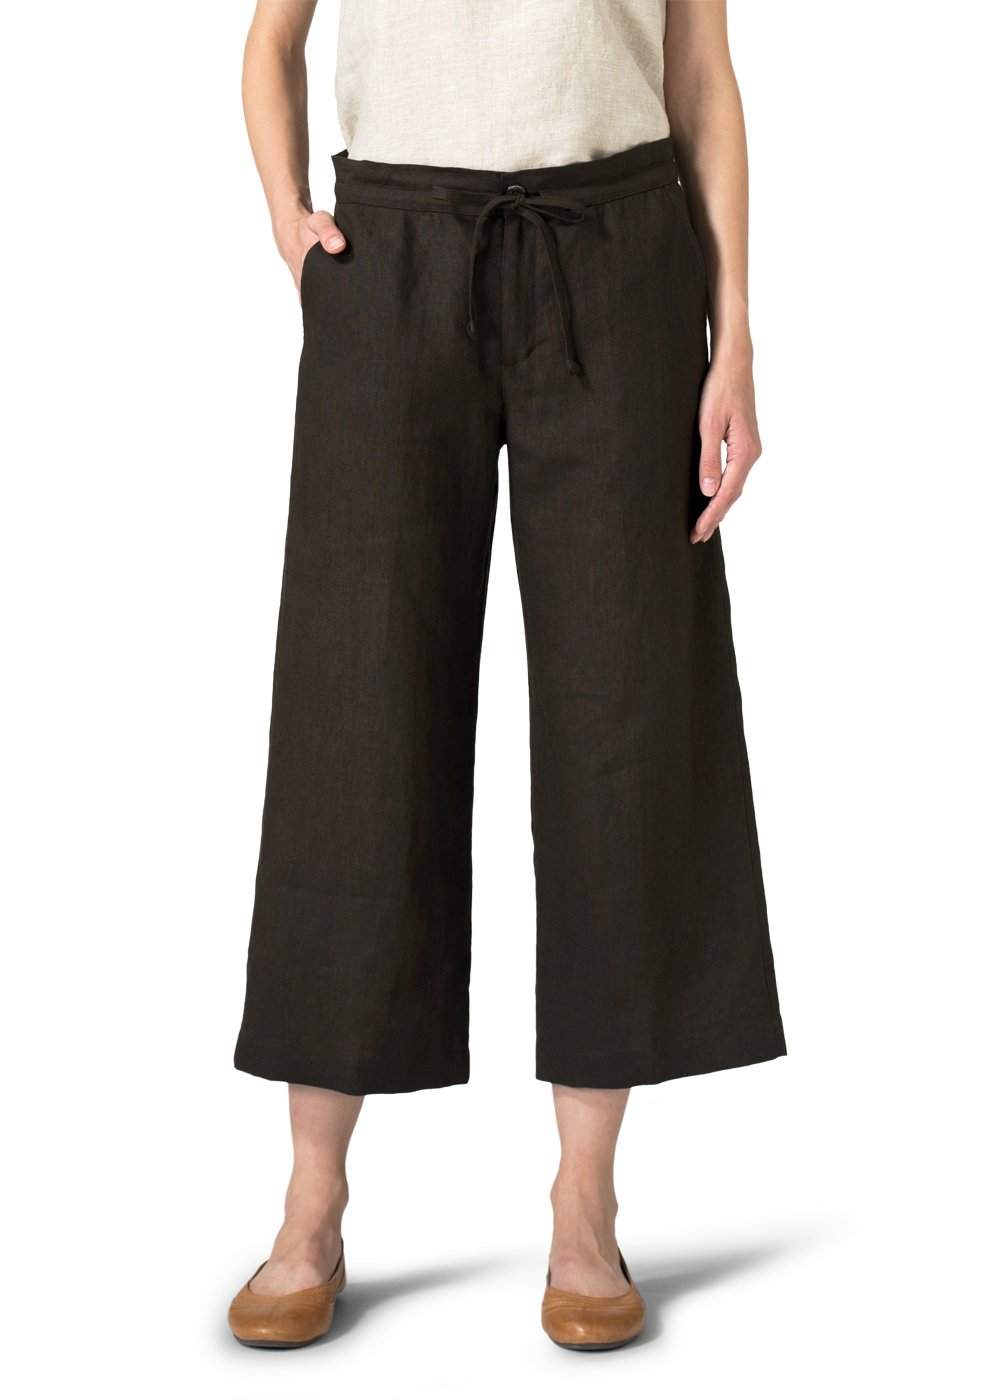 Vivid Linen Crop Drawstring Pants-2X-Dark Brown